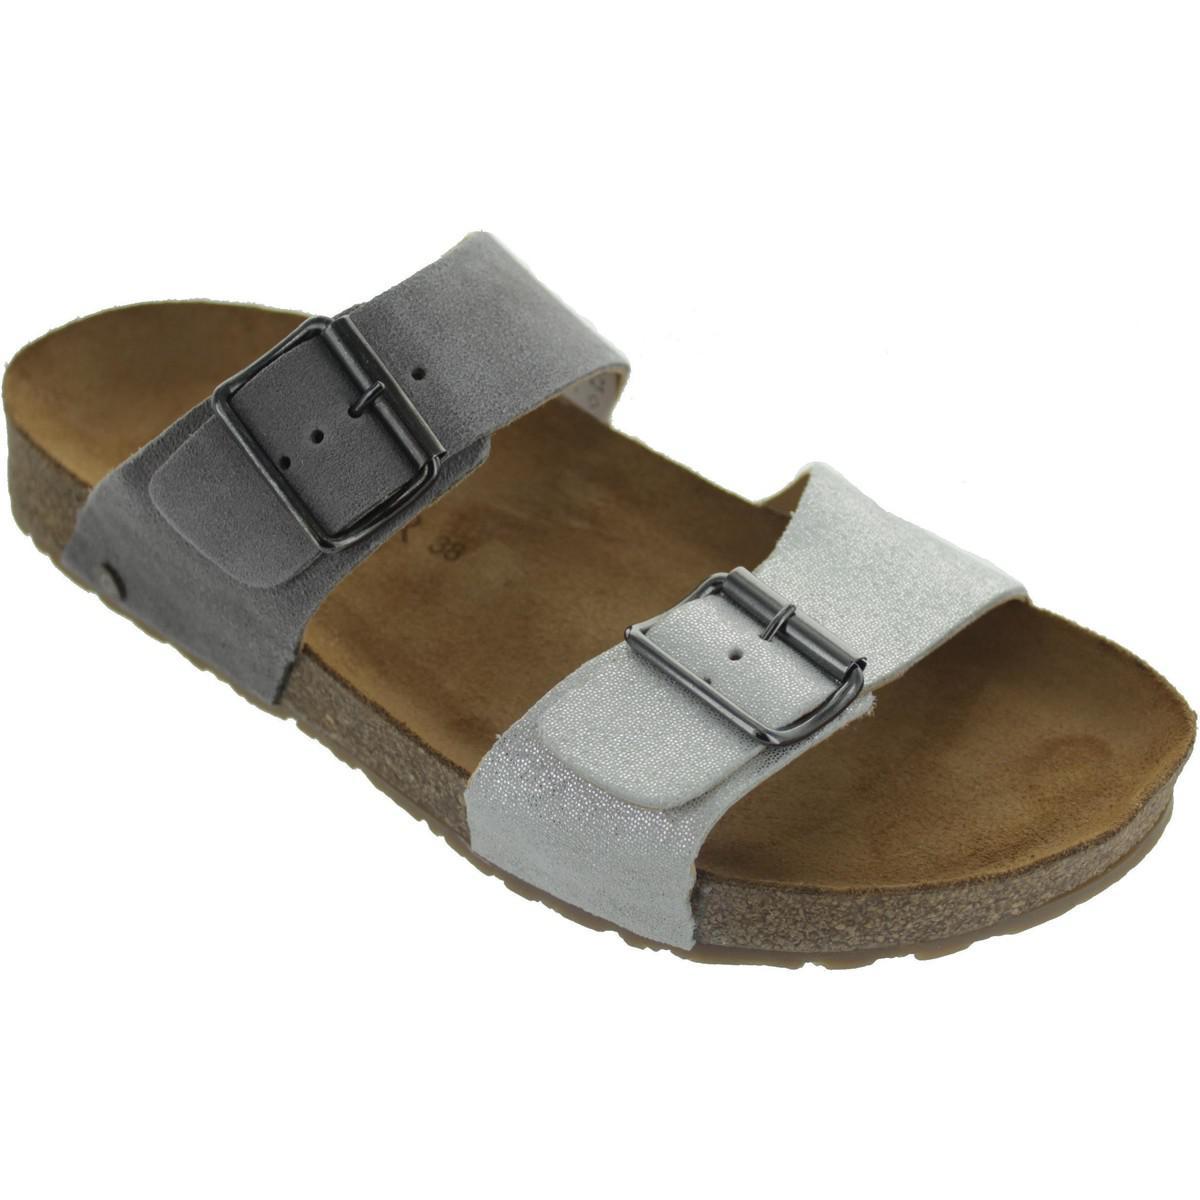 ec5f3923c909e Haflinger Bio Andrea Women s Sandals In Silver in Metallic - Lyst